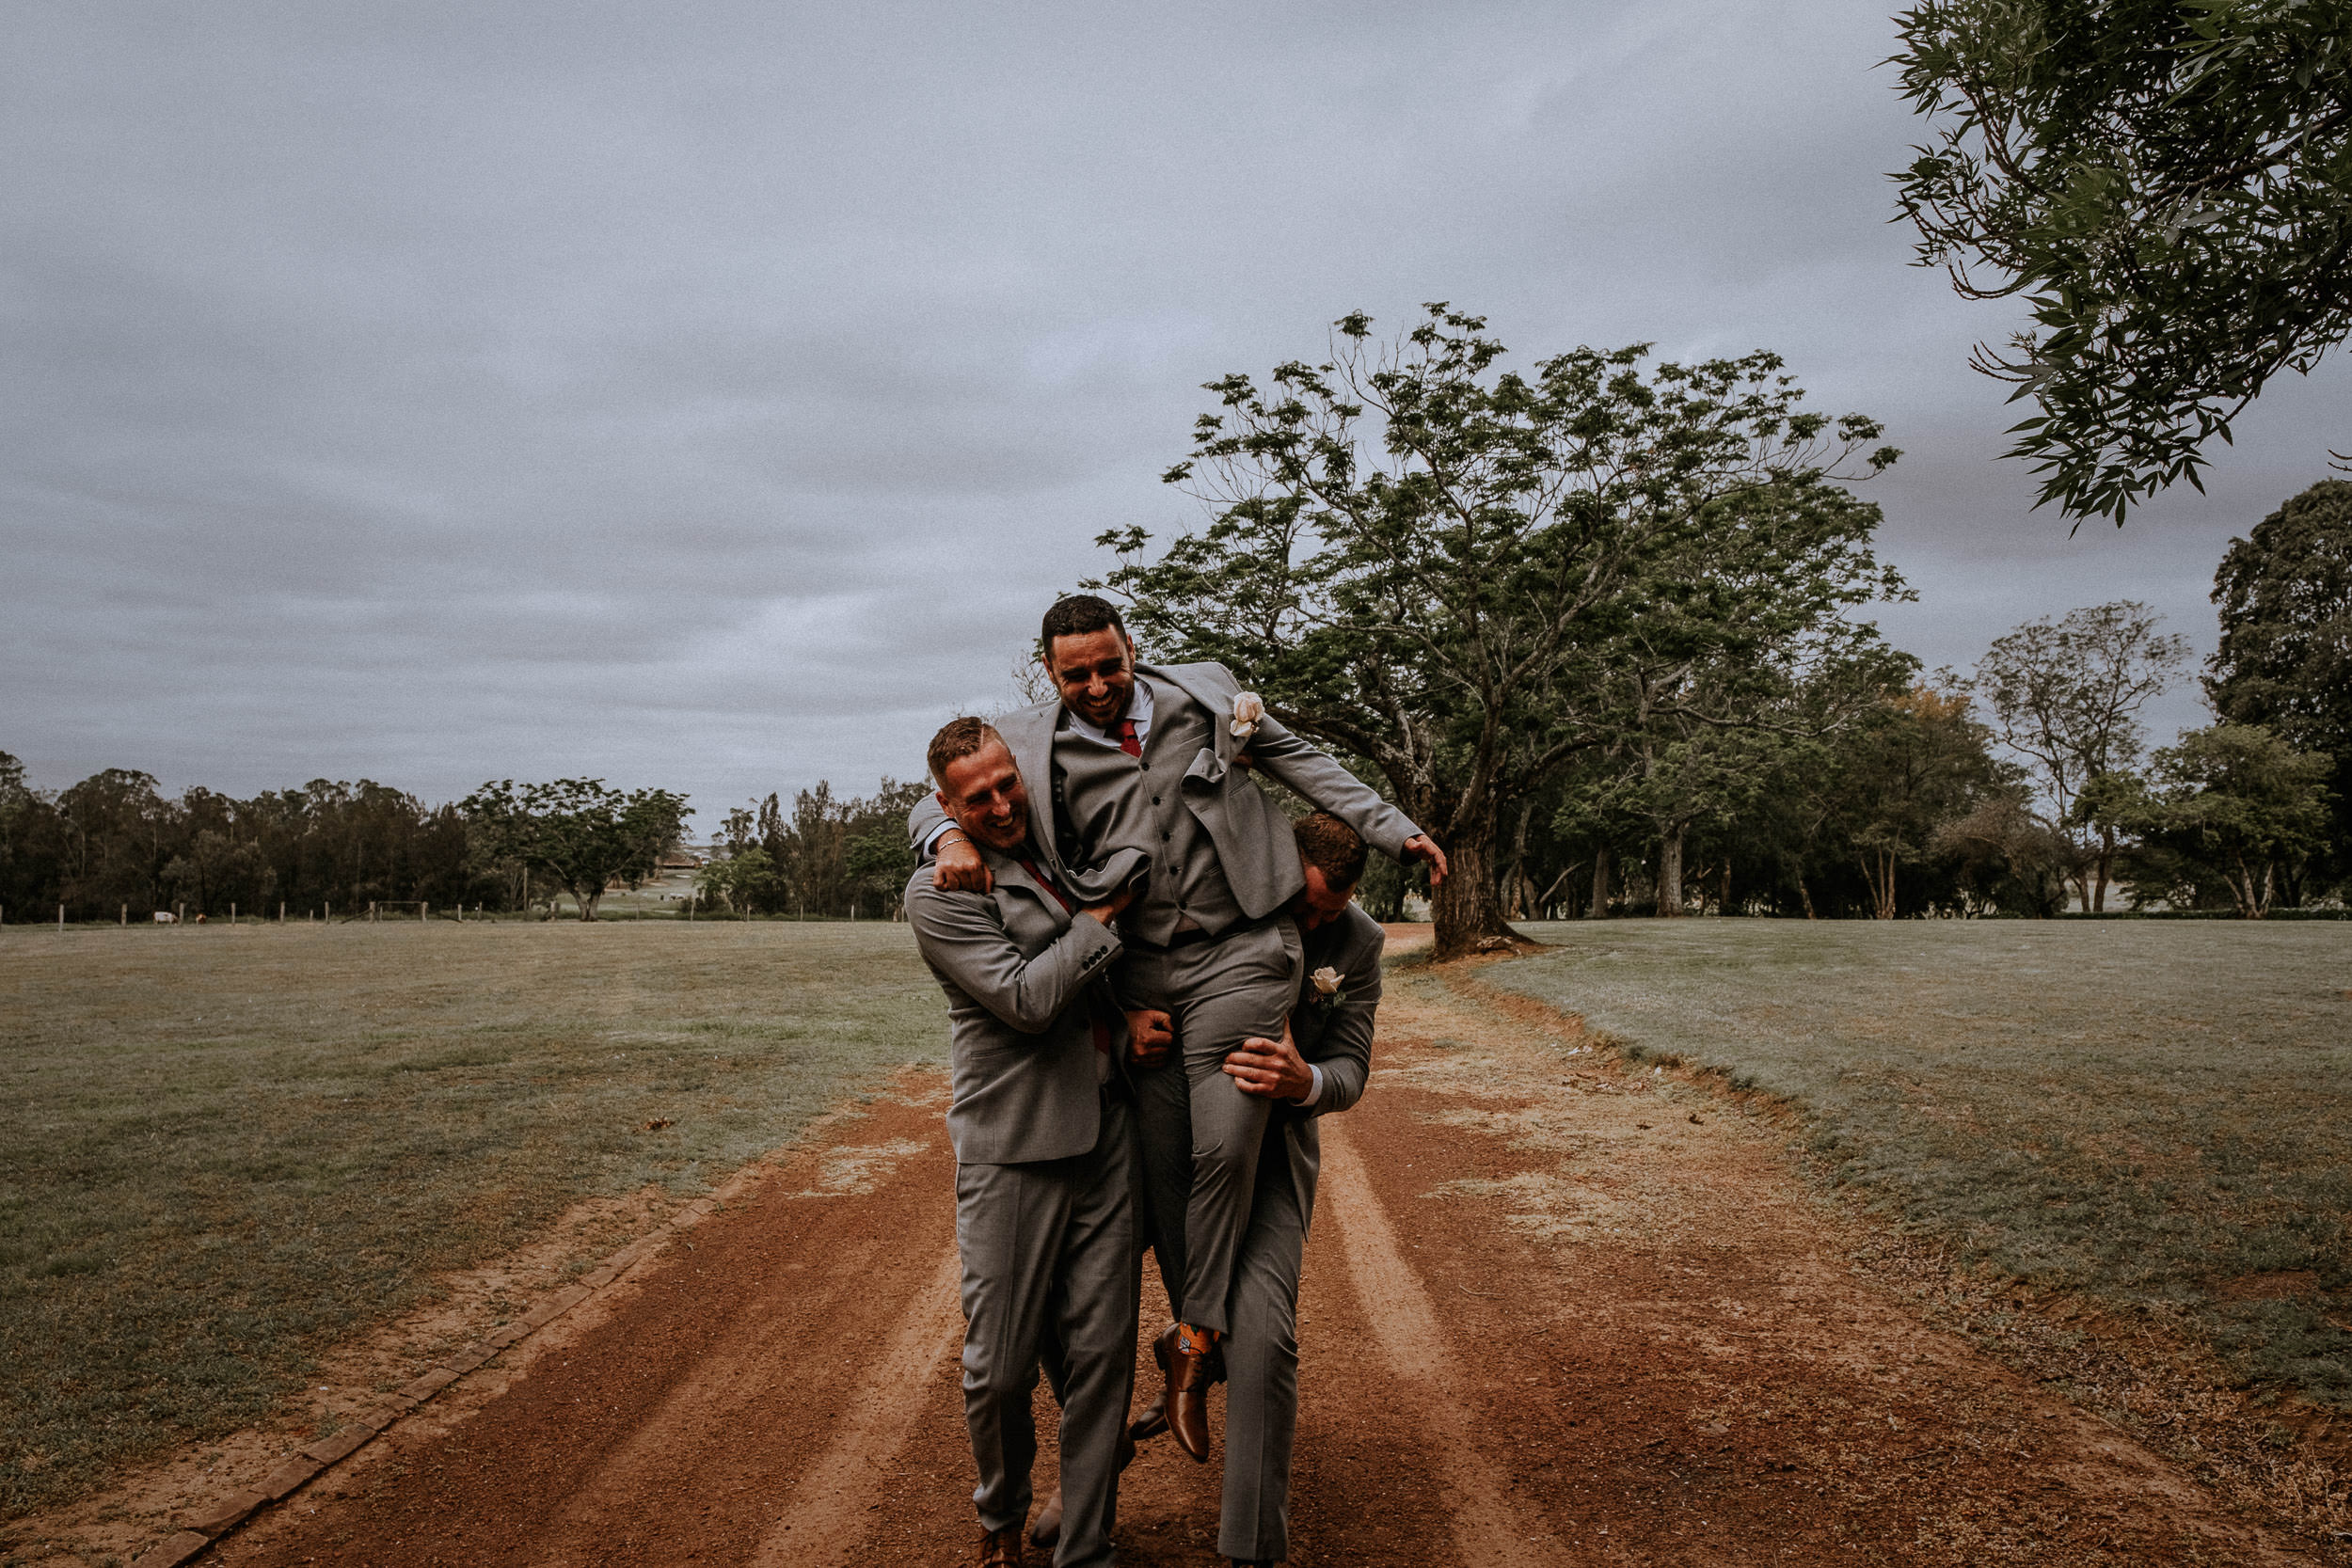 sav & mike_elopement wedding photography_kings & thieves_blog (11 of 44).jpg